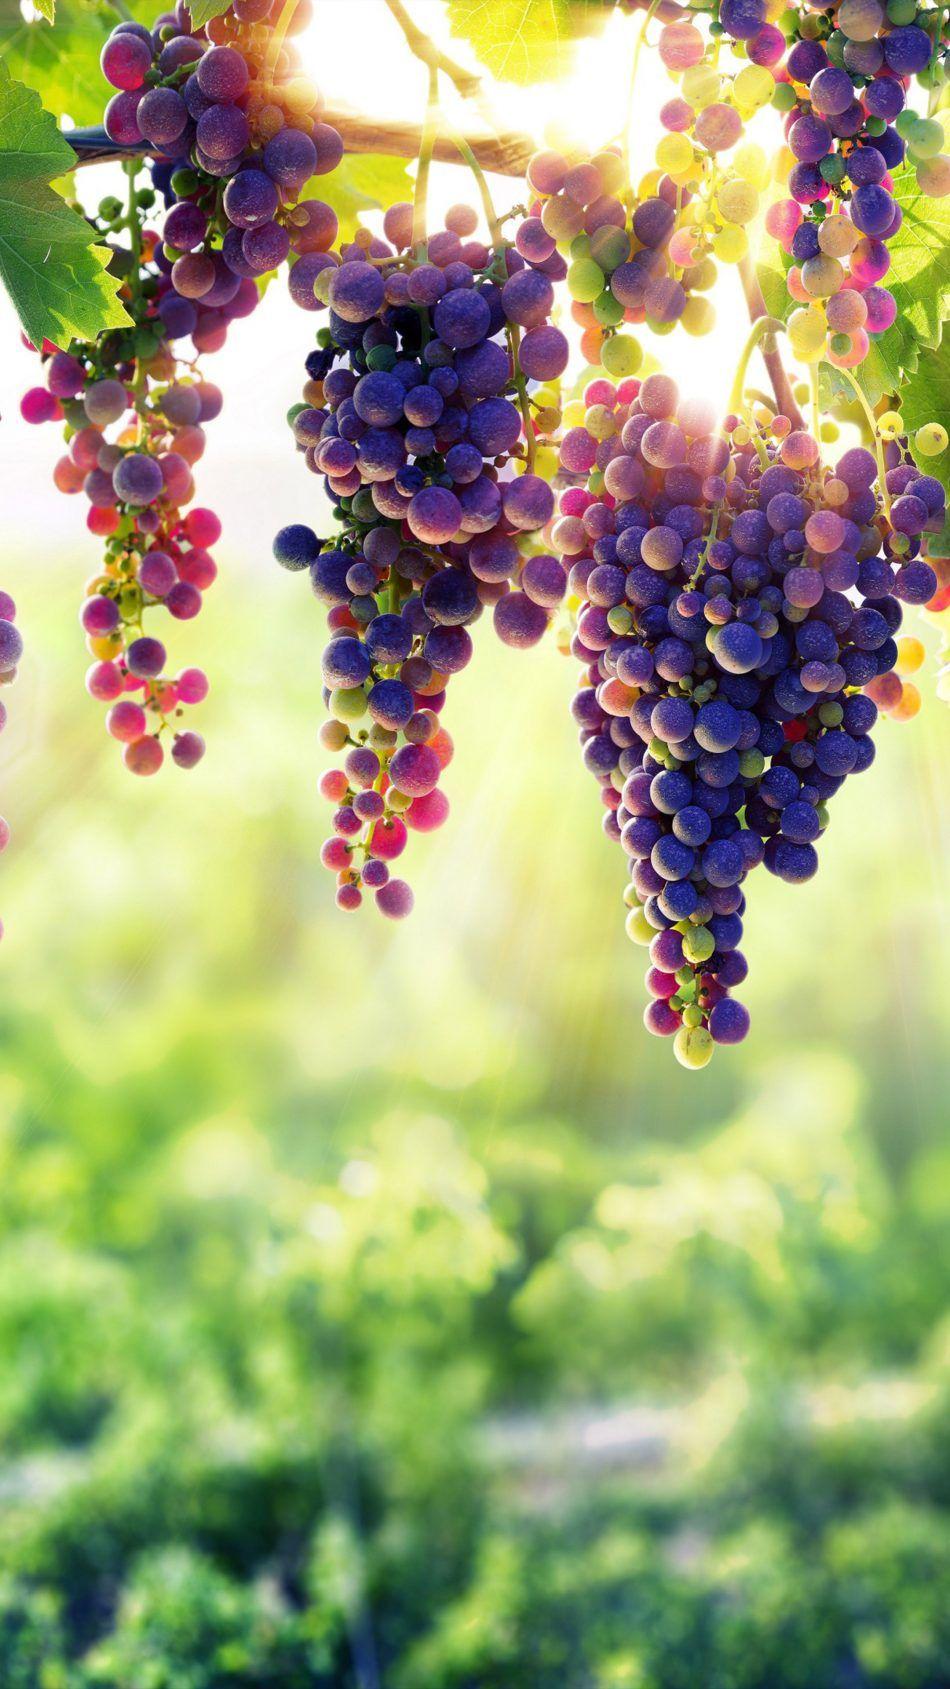 Grapes Grape wallpaper, 8k wallpaper, Mobile wallpaper